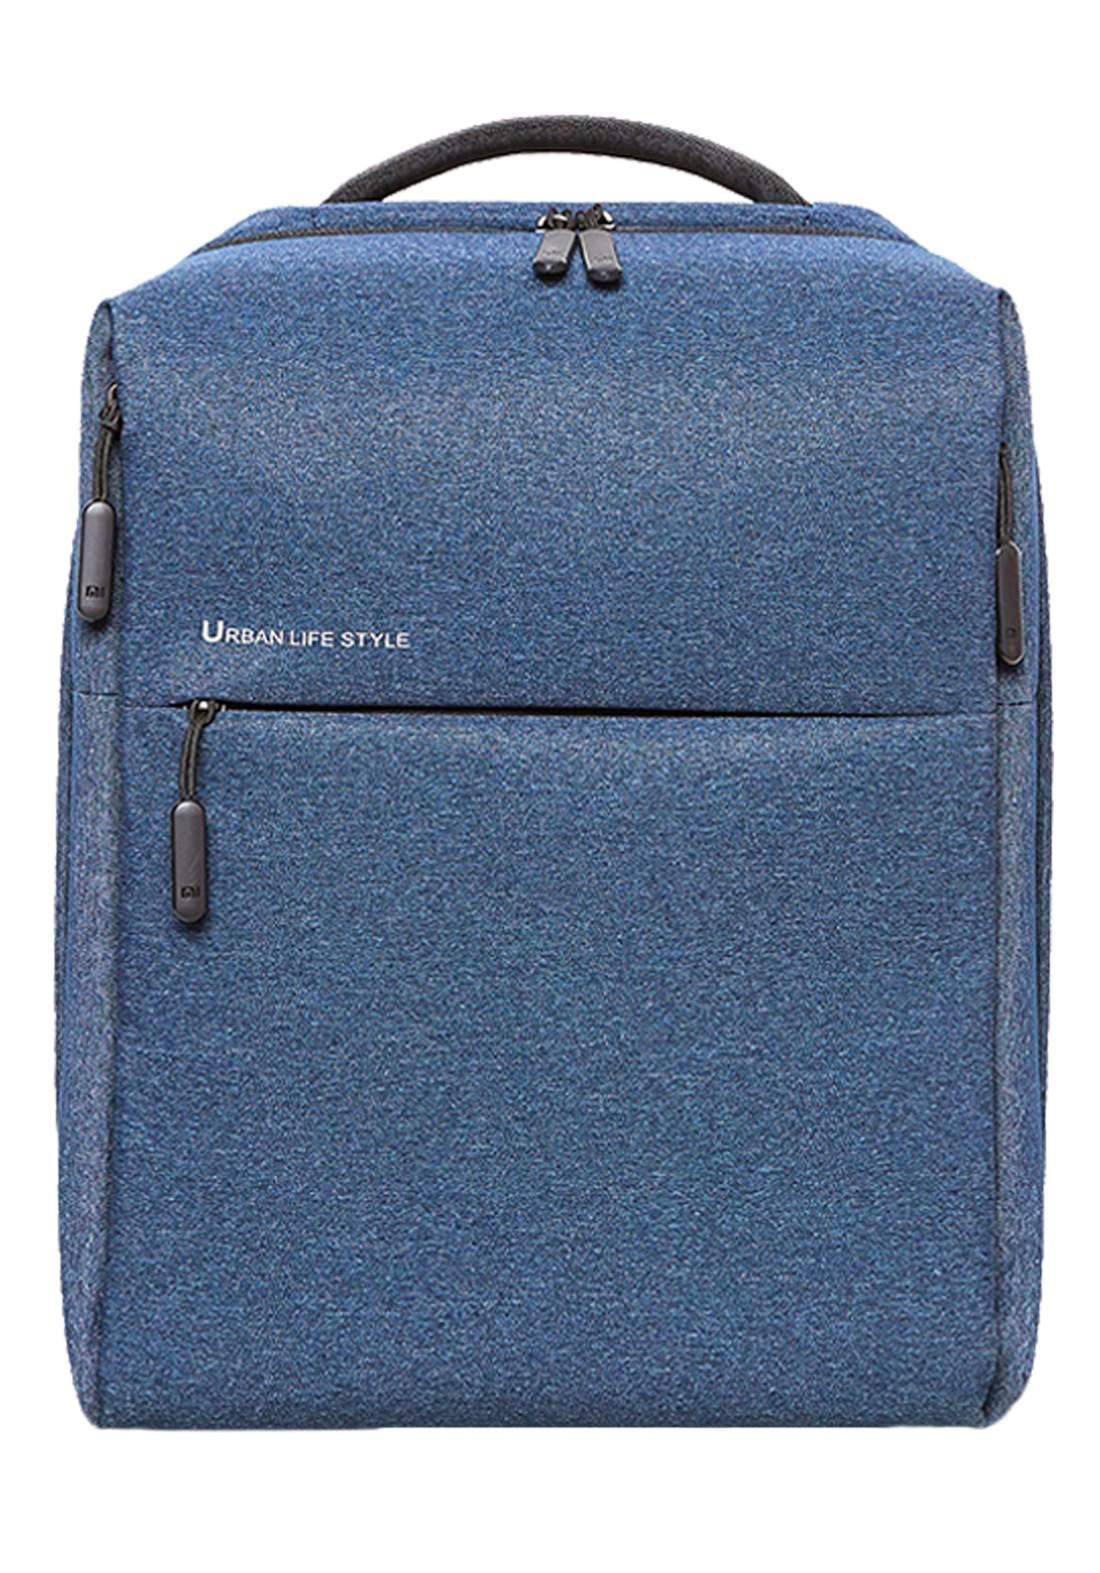 Xiaomi Mi City Backpack Blue